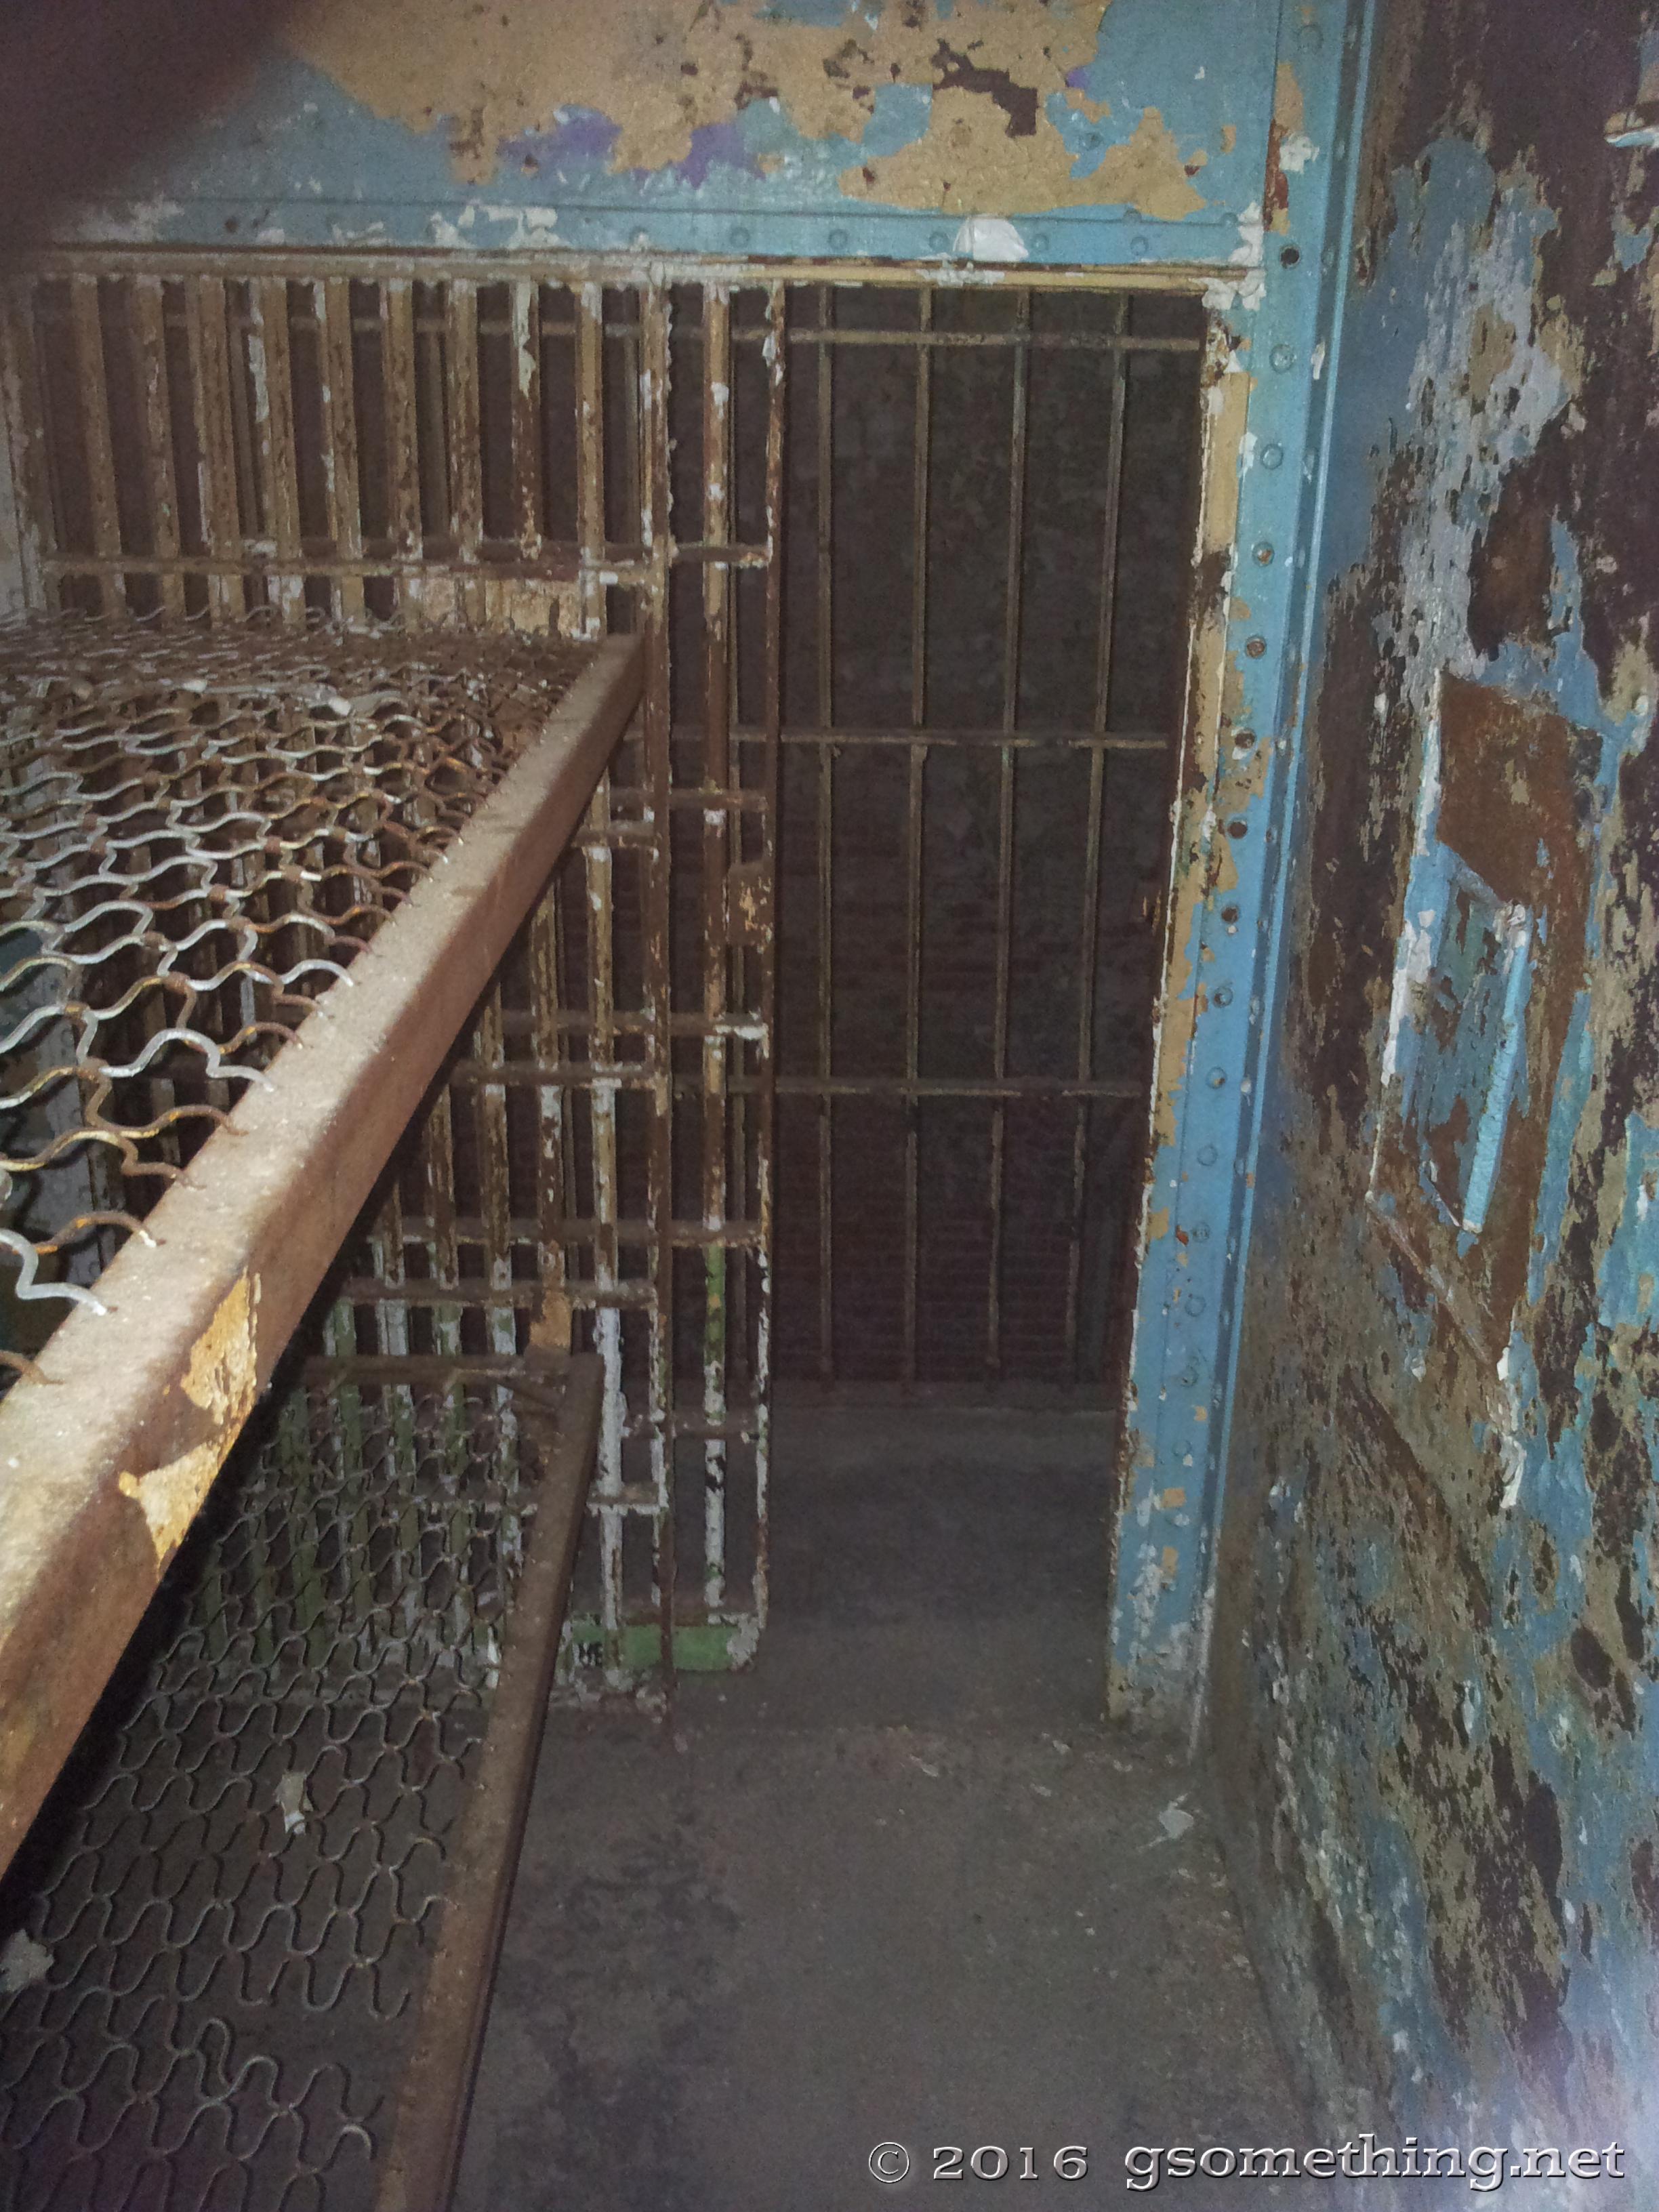 mansfield_reformatory_1st_trip_35.jpg